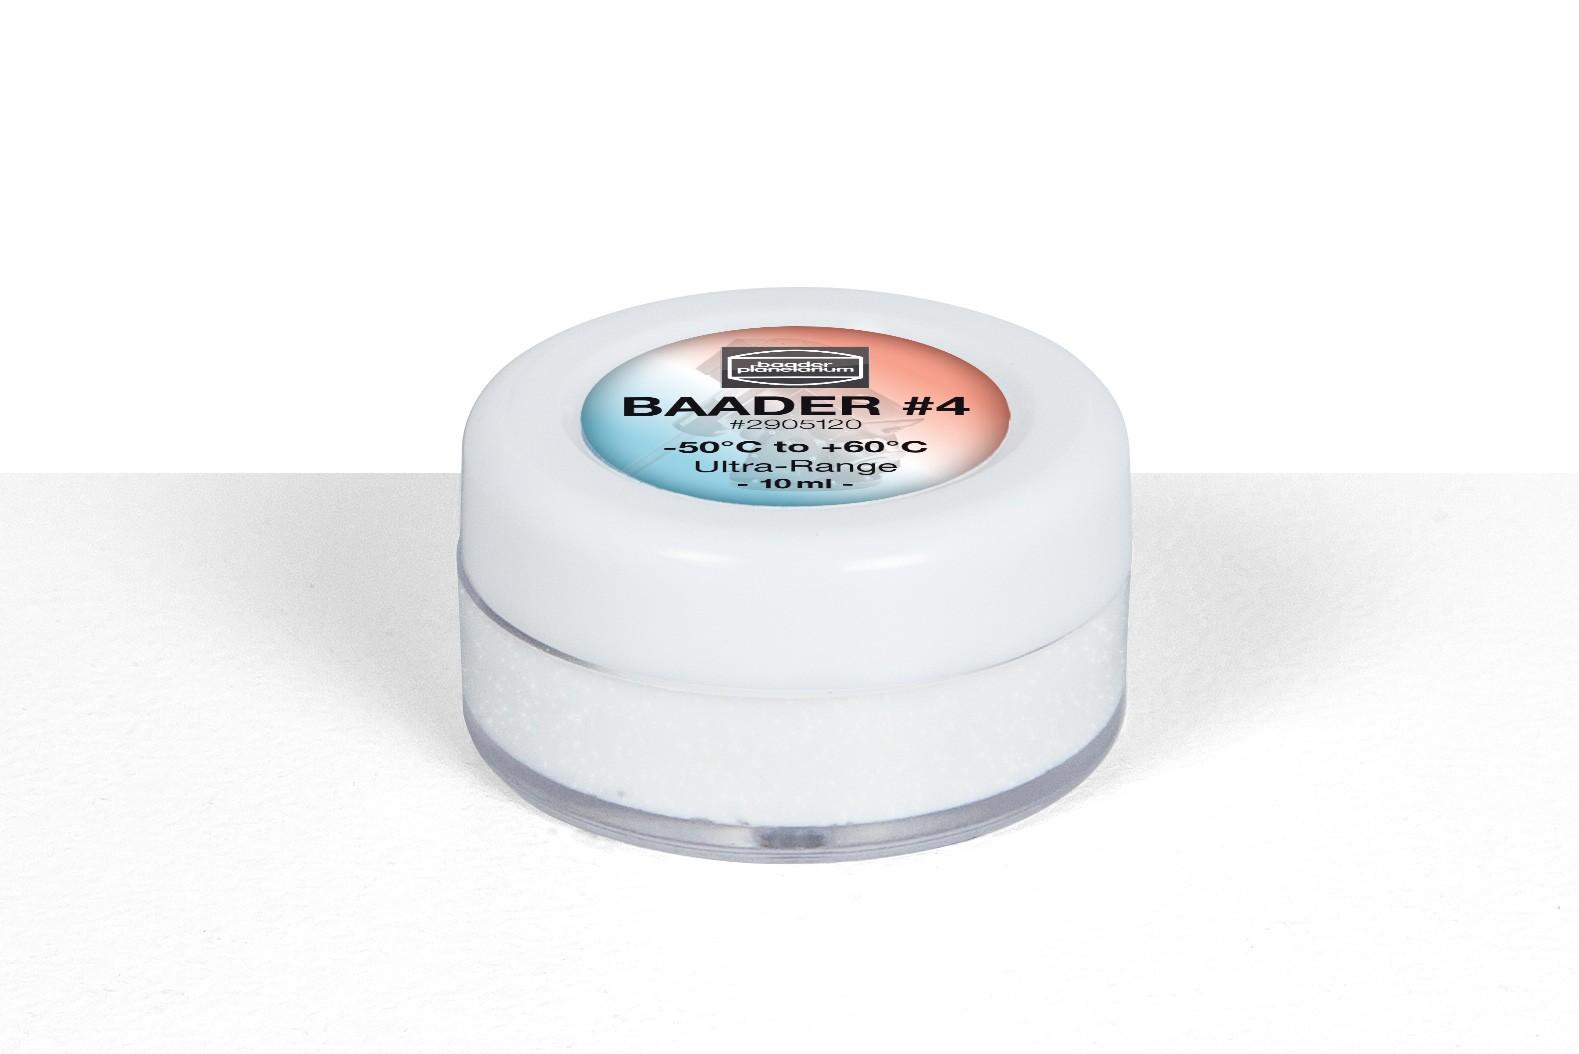 Baader Machine-Grease #4 Ultra-Range (-50°C–+60°C)